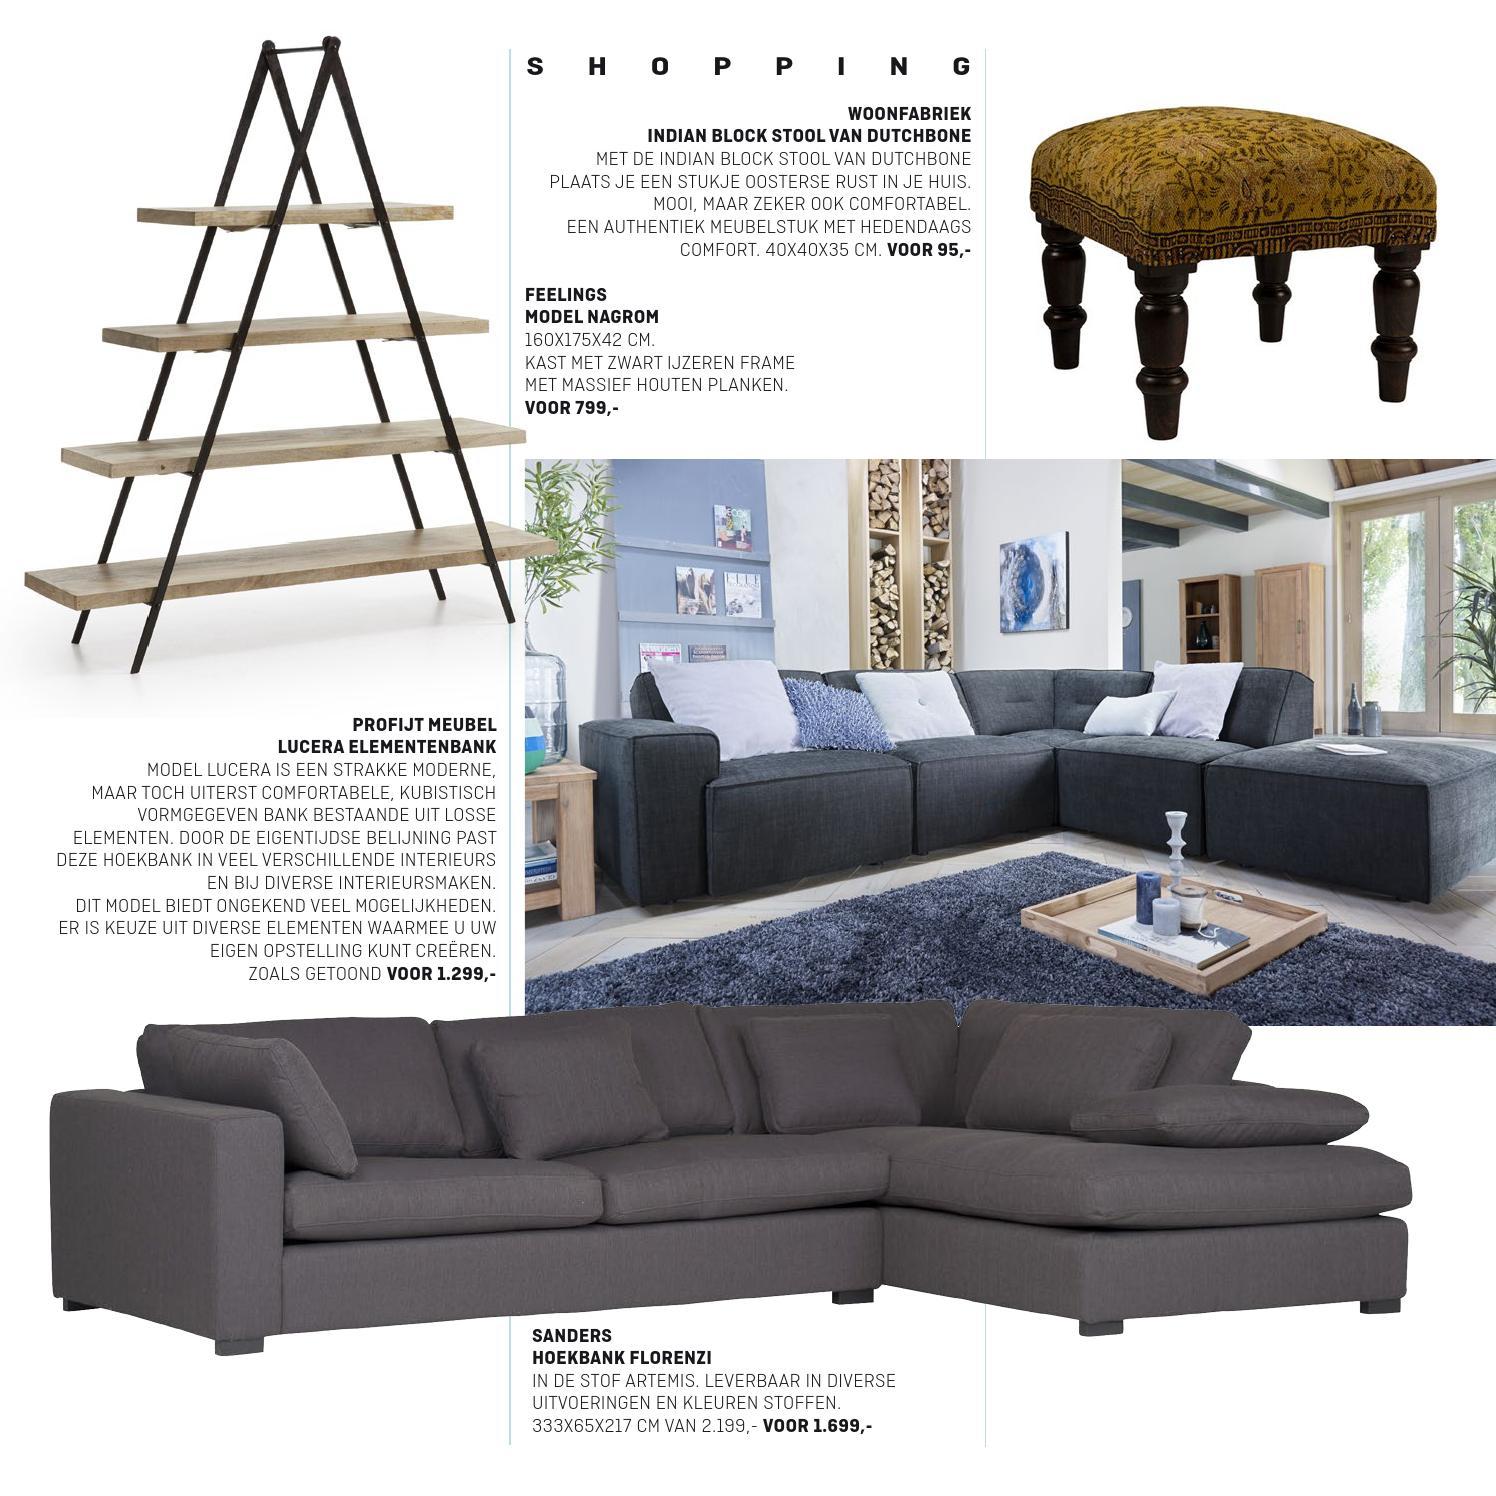 Design Bank Losse Elementen.Villa Arena Lente Magazine 2015 By Villa Arena Issuu